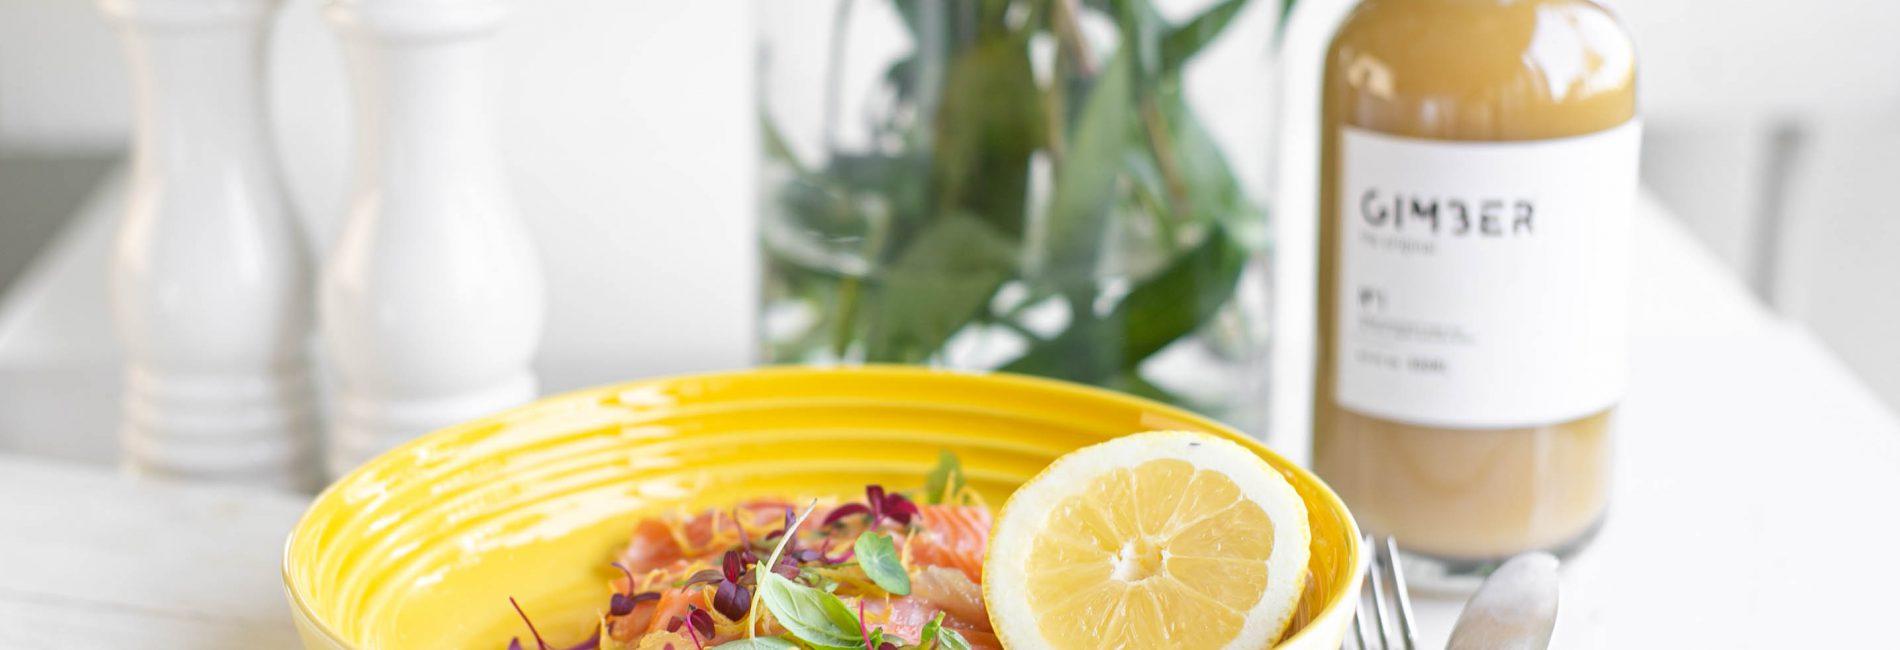 Zalm ceviche met passievrucht, Gimber en citroen